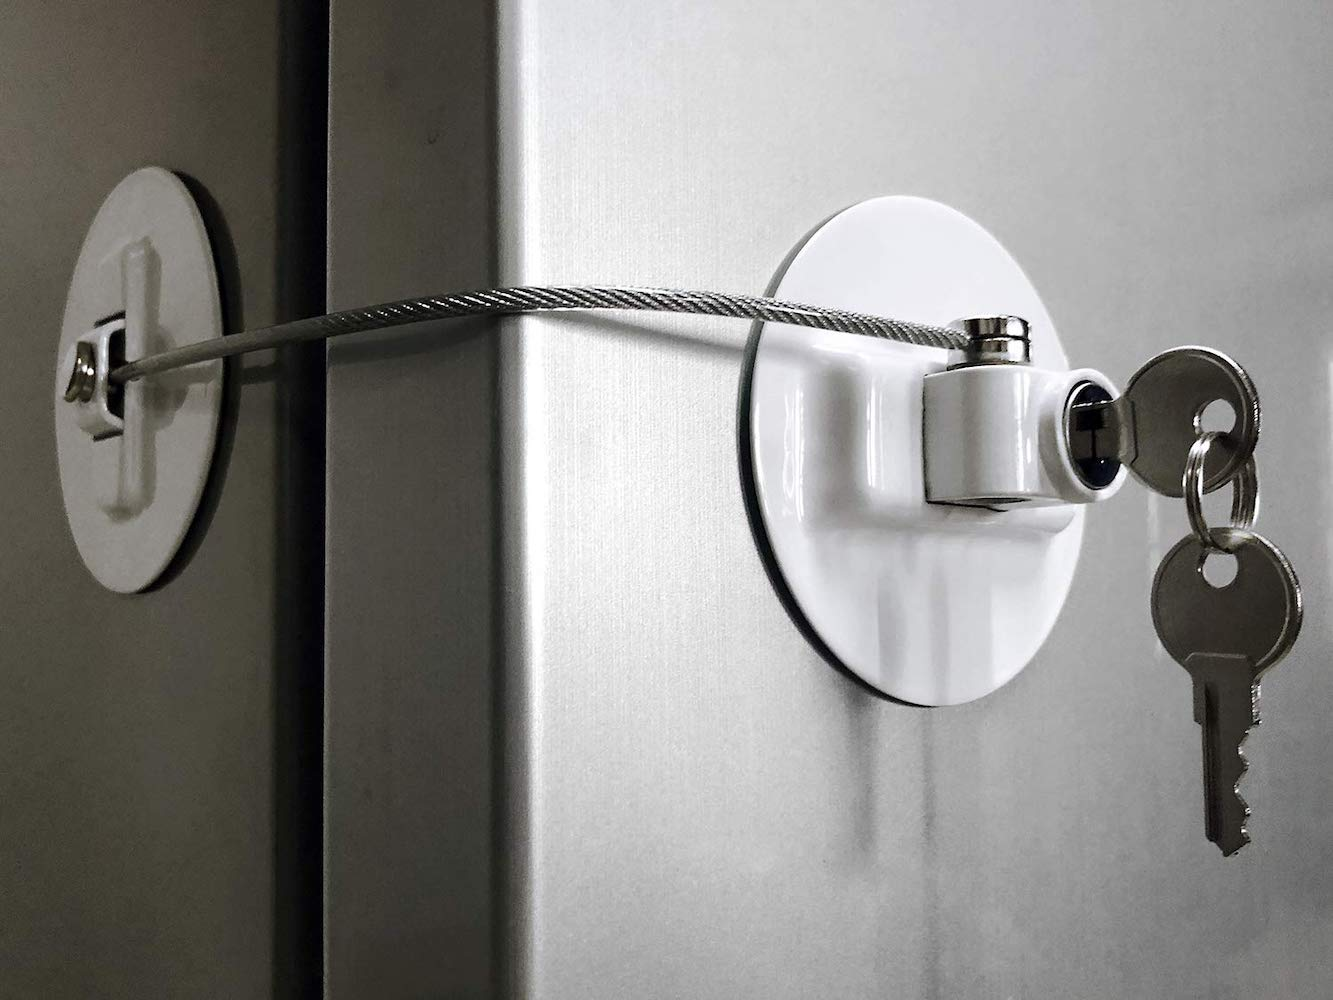 Muin Refrigerator Door Lock is food security like you've never seen it before